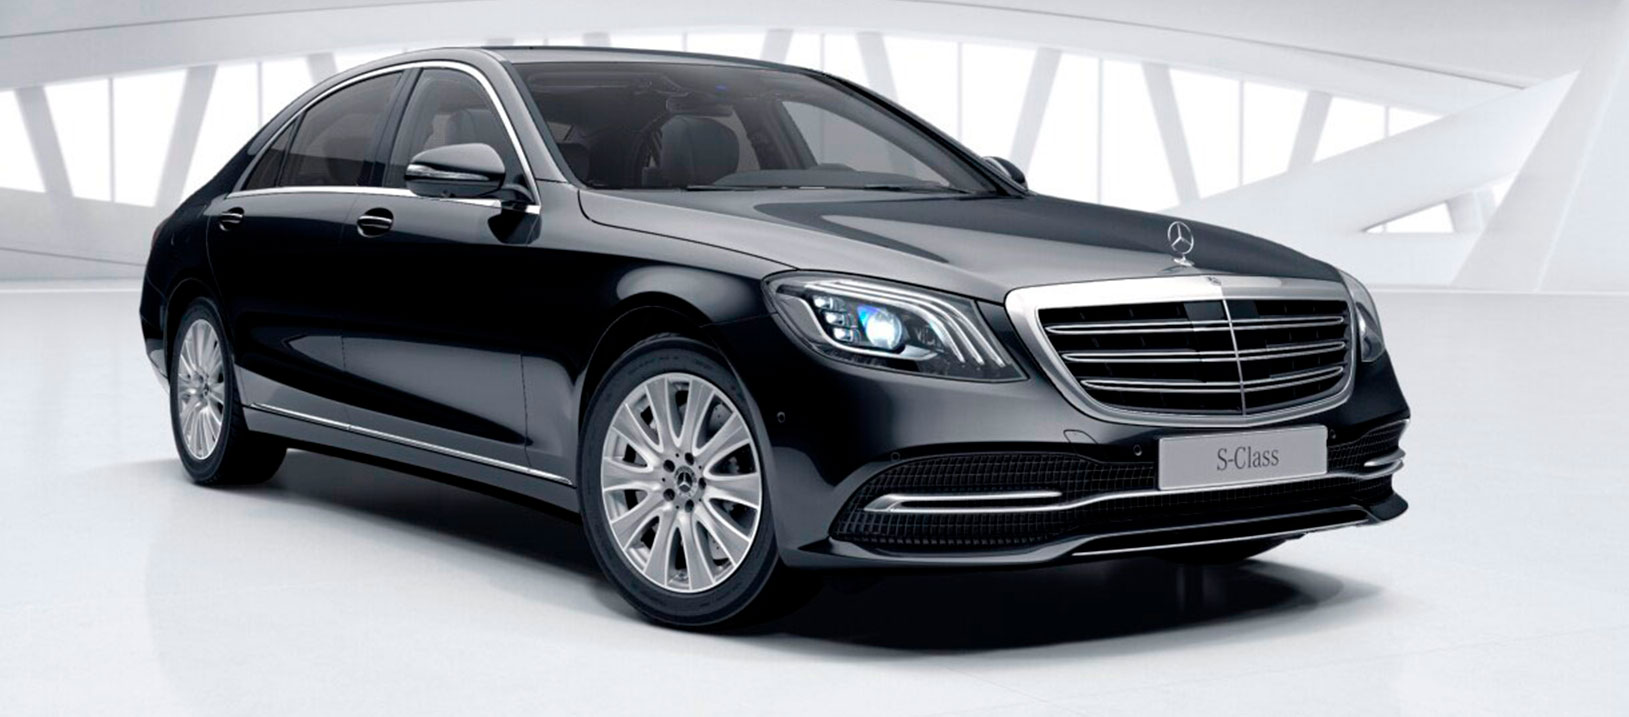 Mercedes-Benz S-Class Limousine 52600222